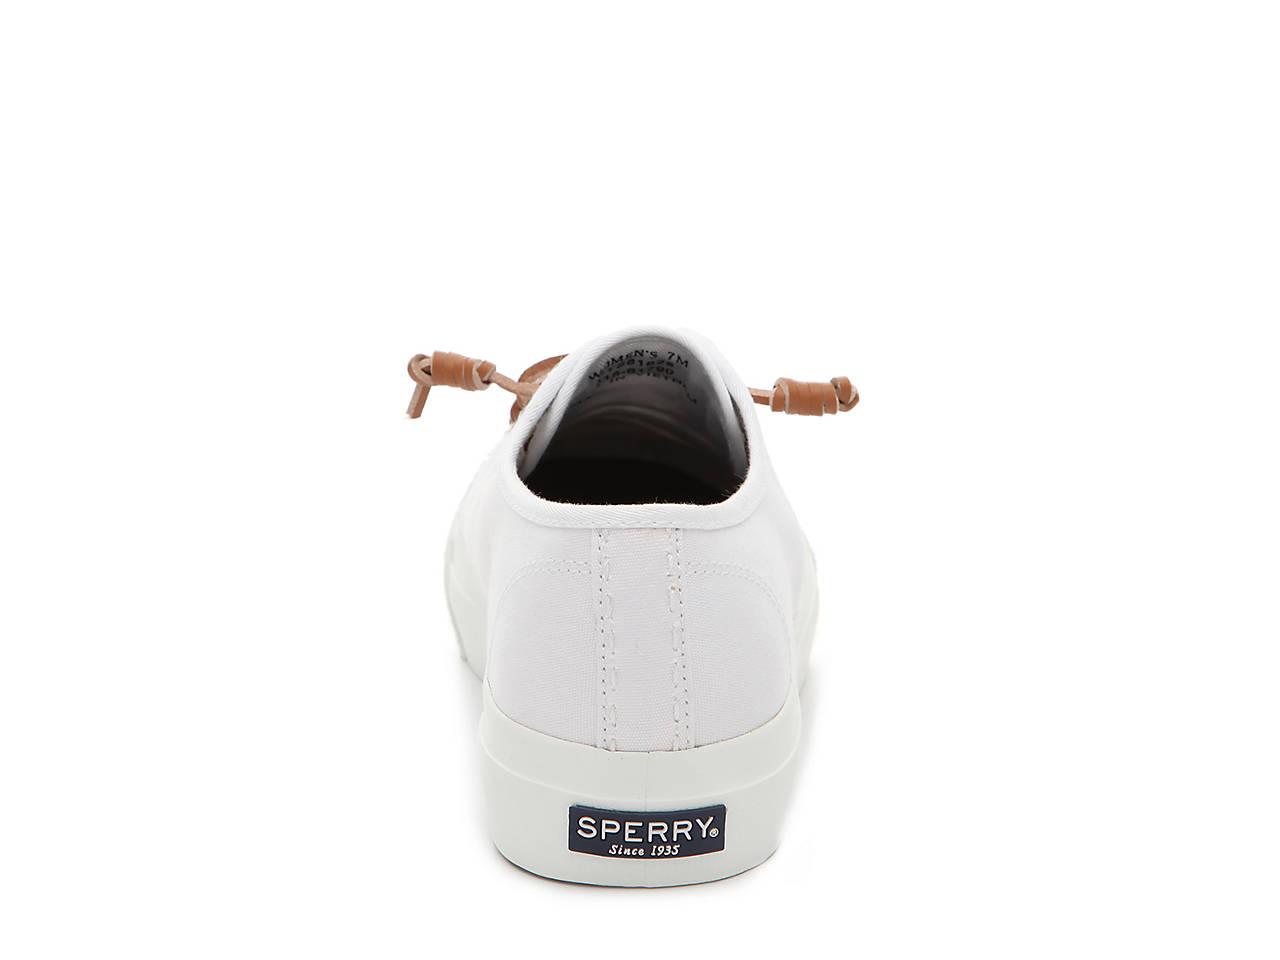 89cb189c0e5 Sperry Top-Sider Cliffside Platform Slip-On Sneaker Women s Shoes